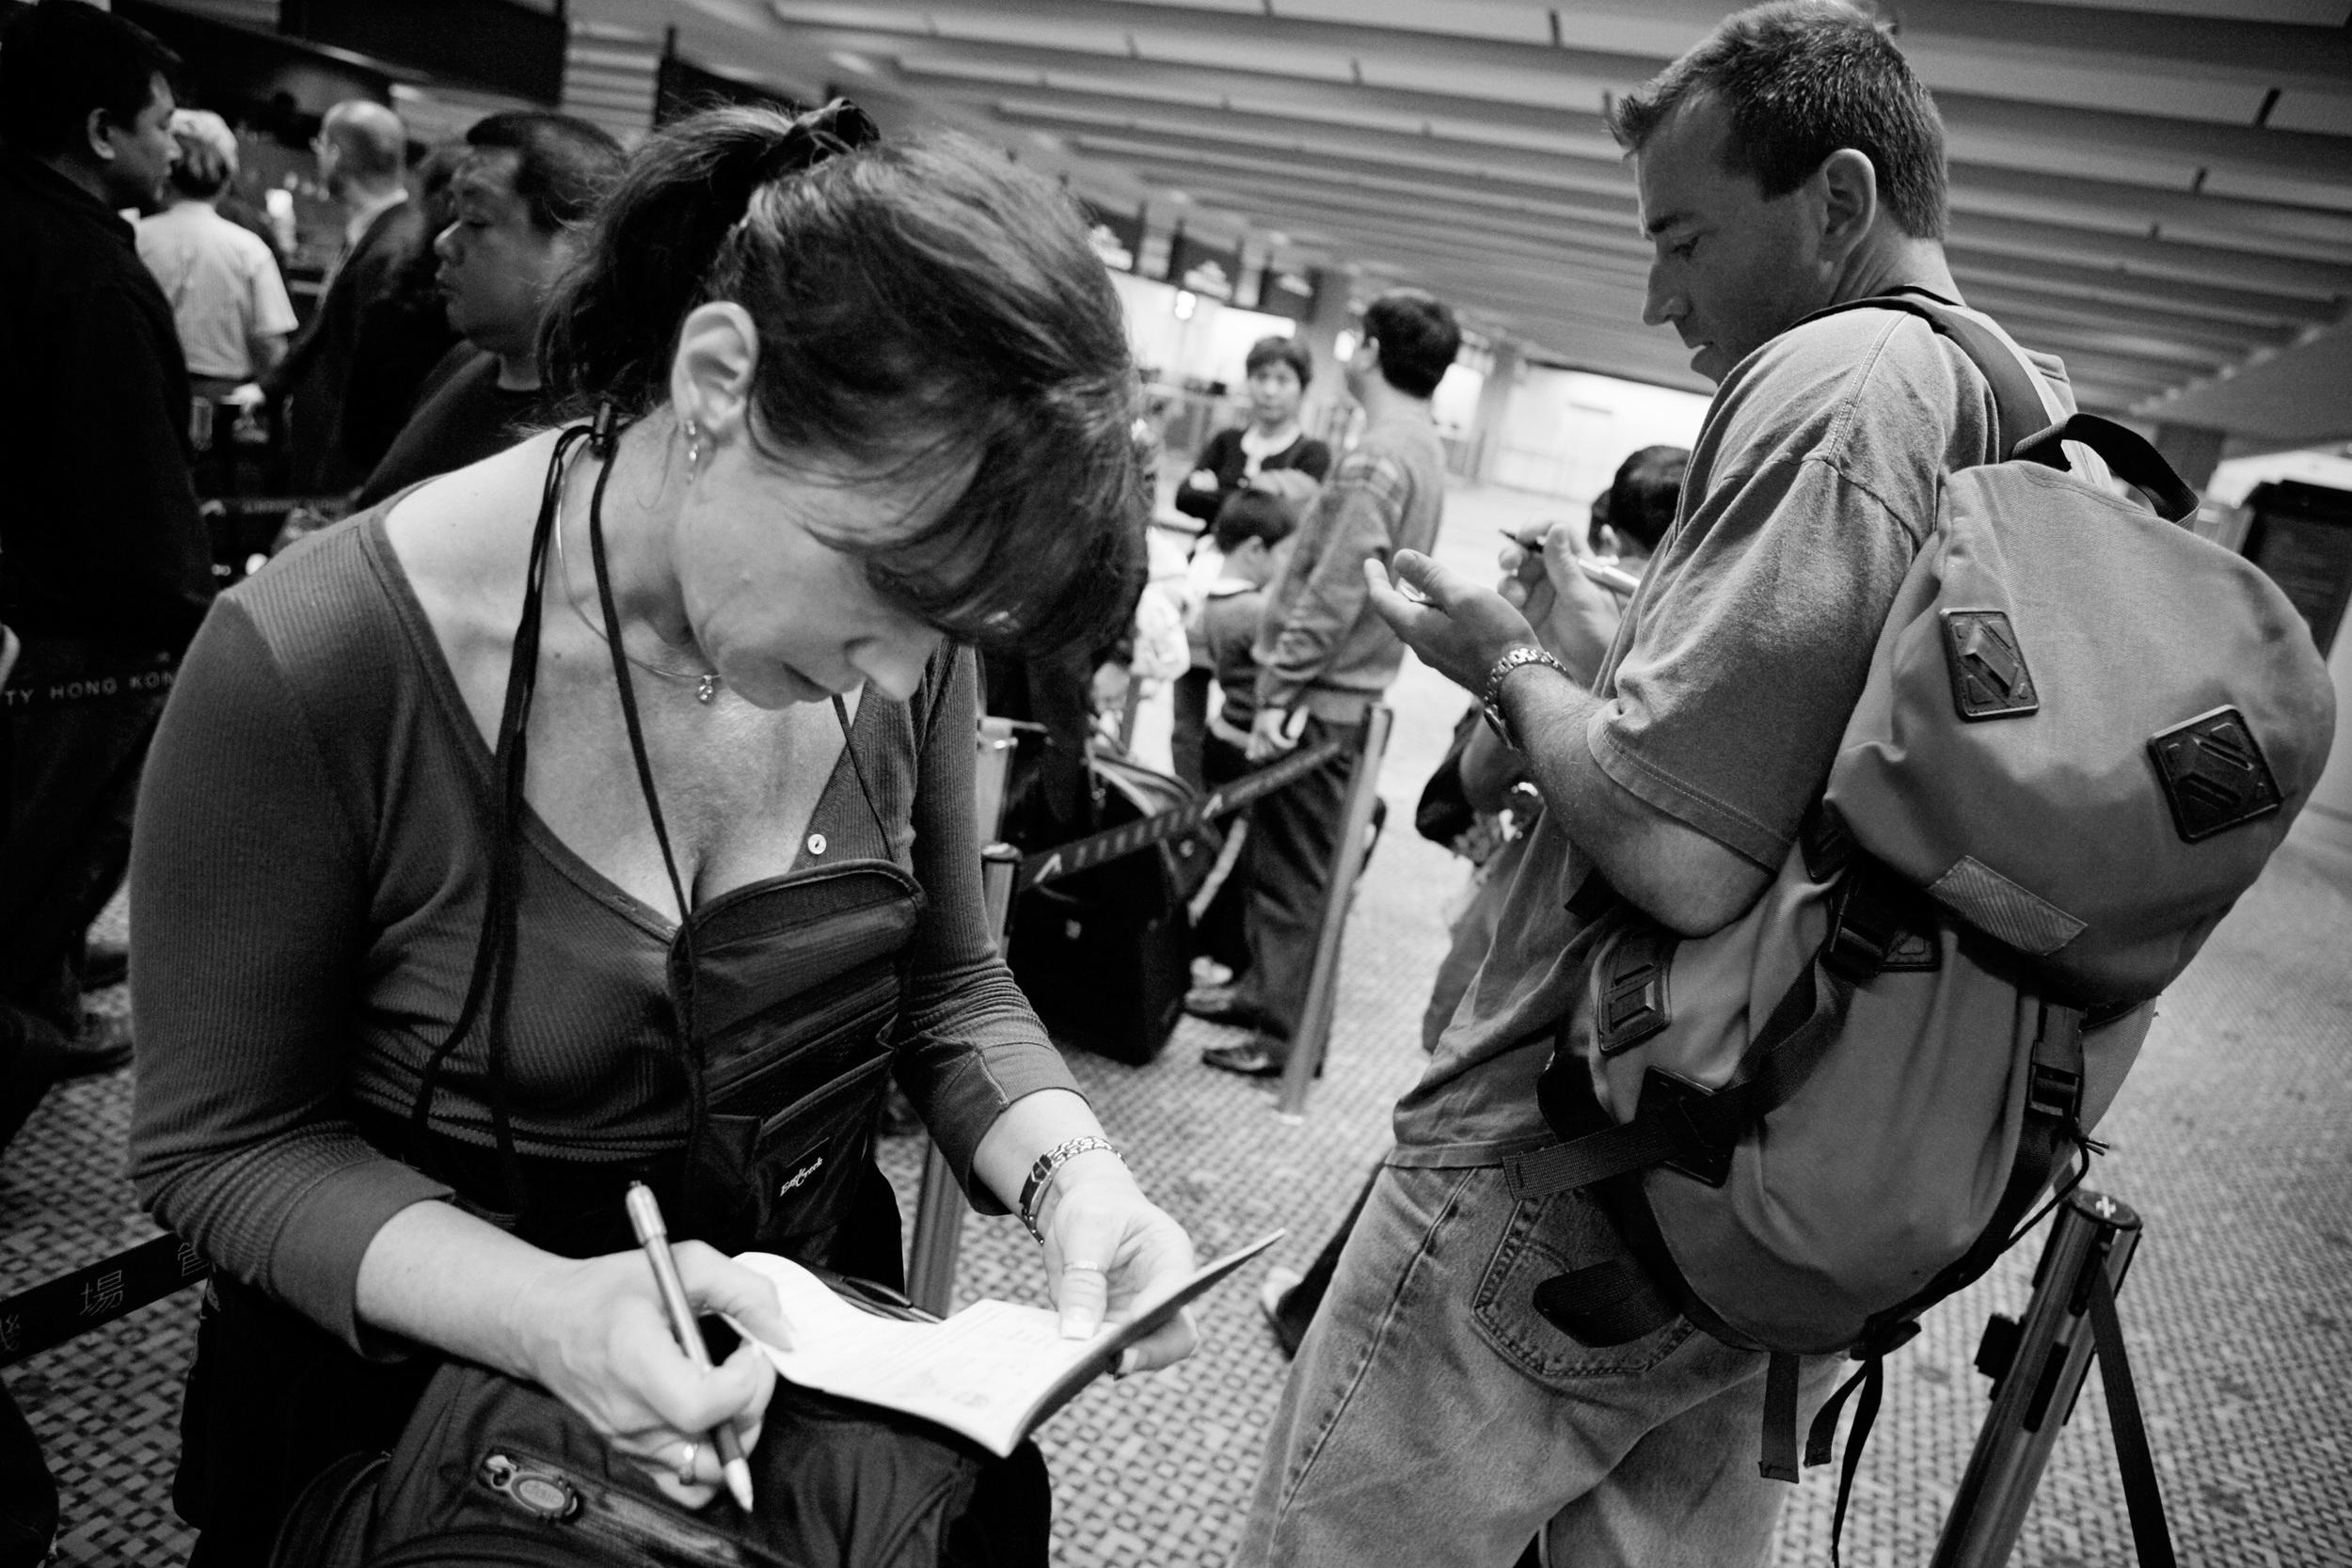 Karen and Bob check their passports after arriving in Hong Kong, China.